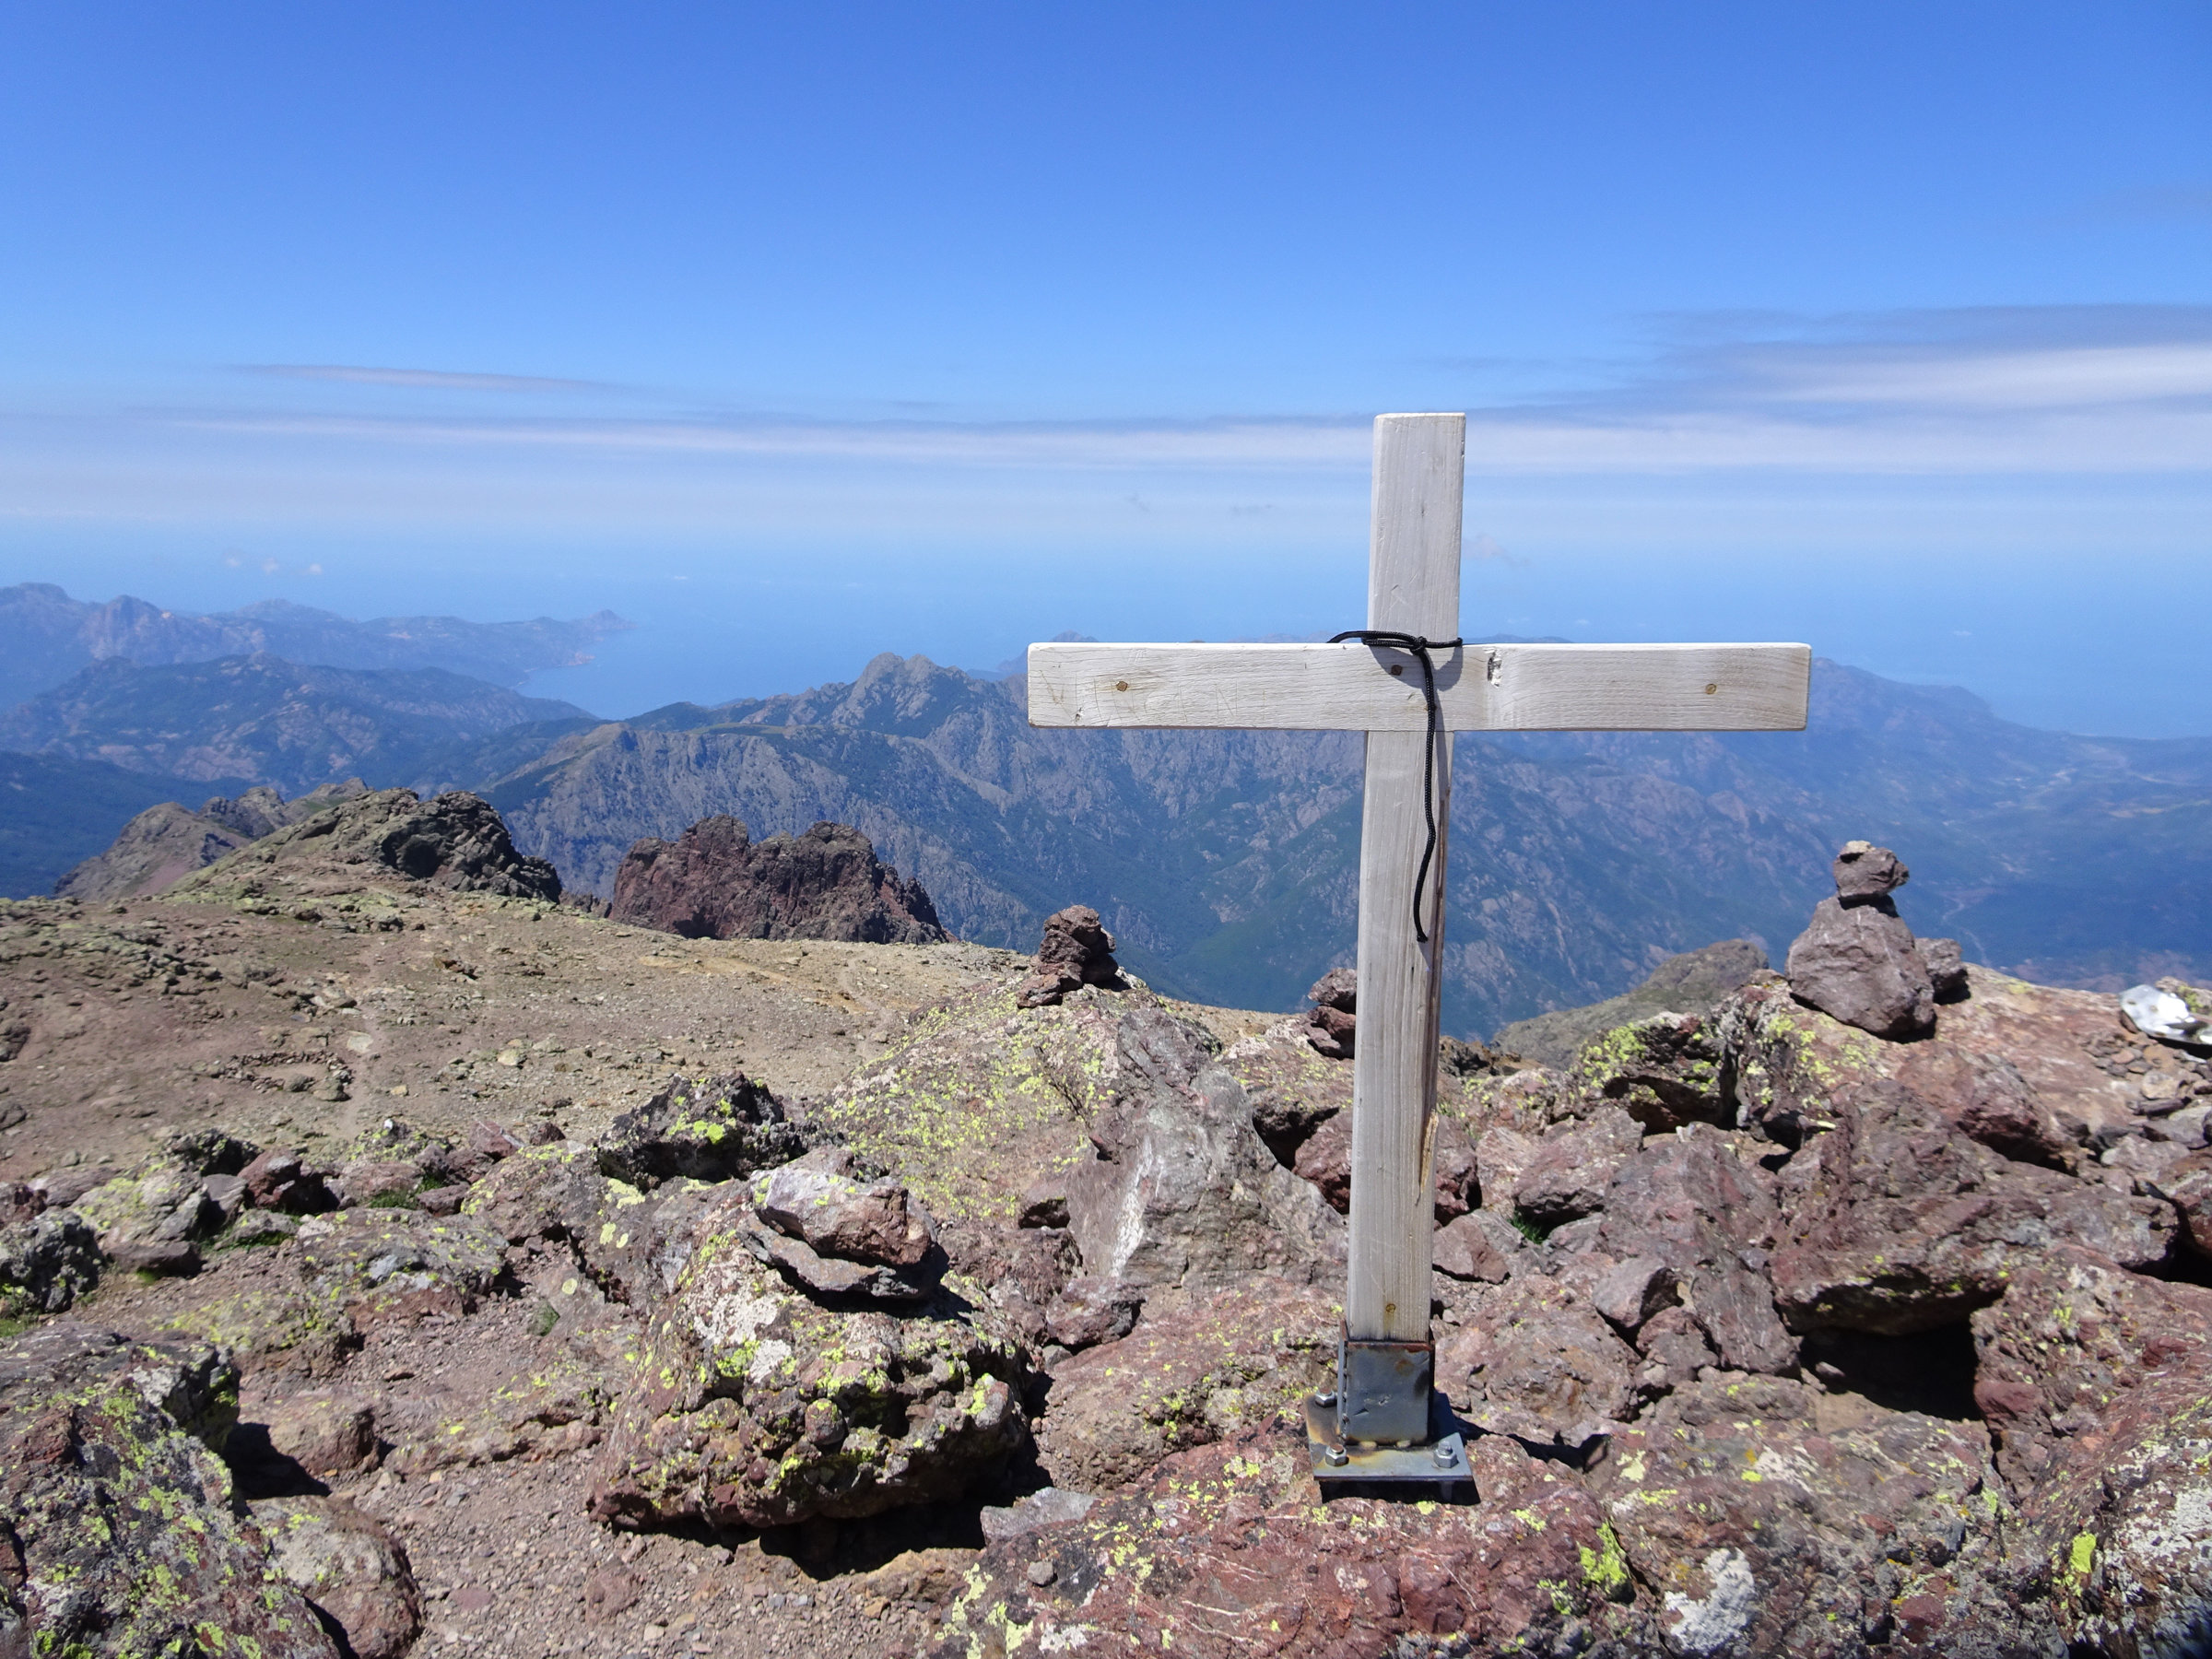 Gipfelglück auf der Paglia Orba, Korsika, GR20 Weitwanderweg, Wandern, Berge, Frankreich